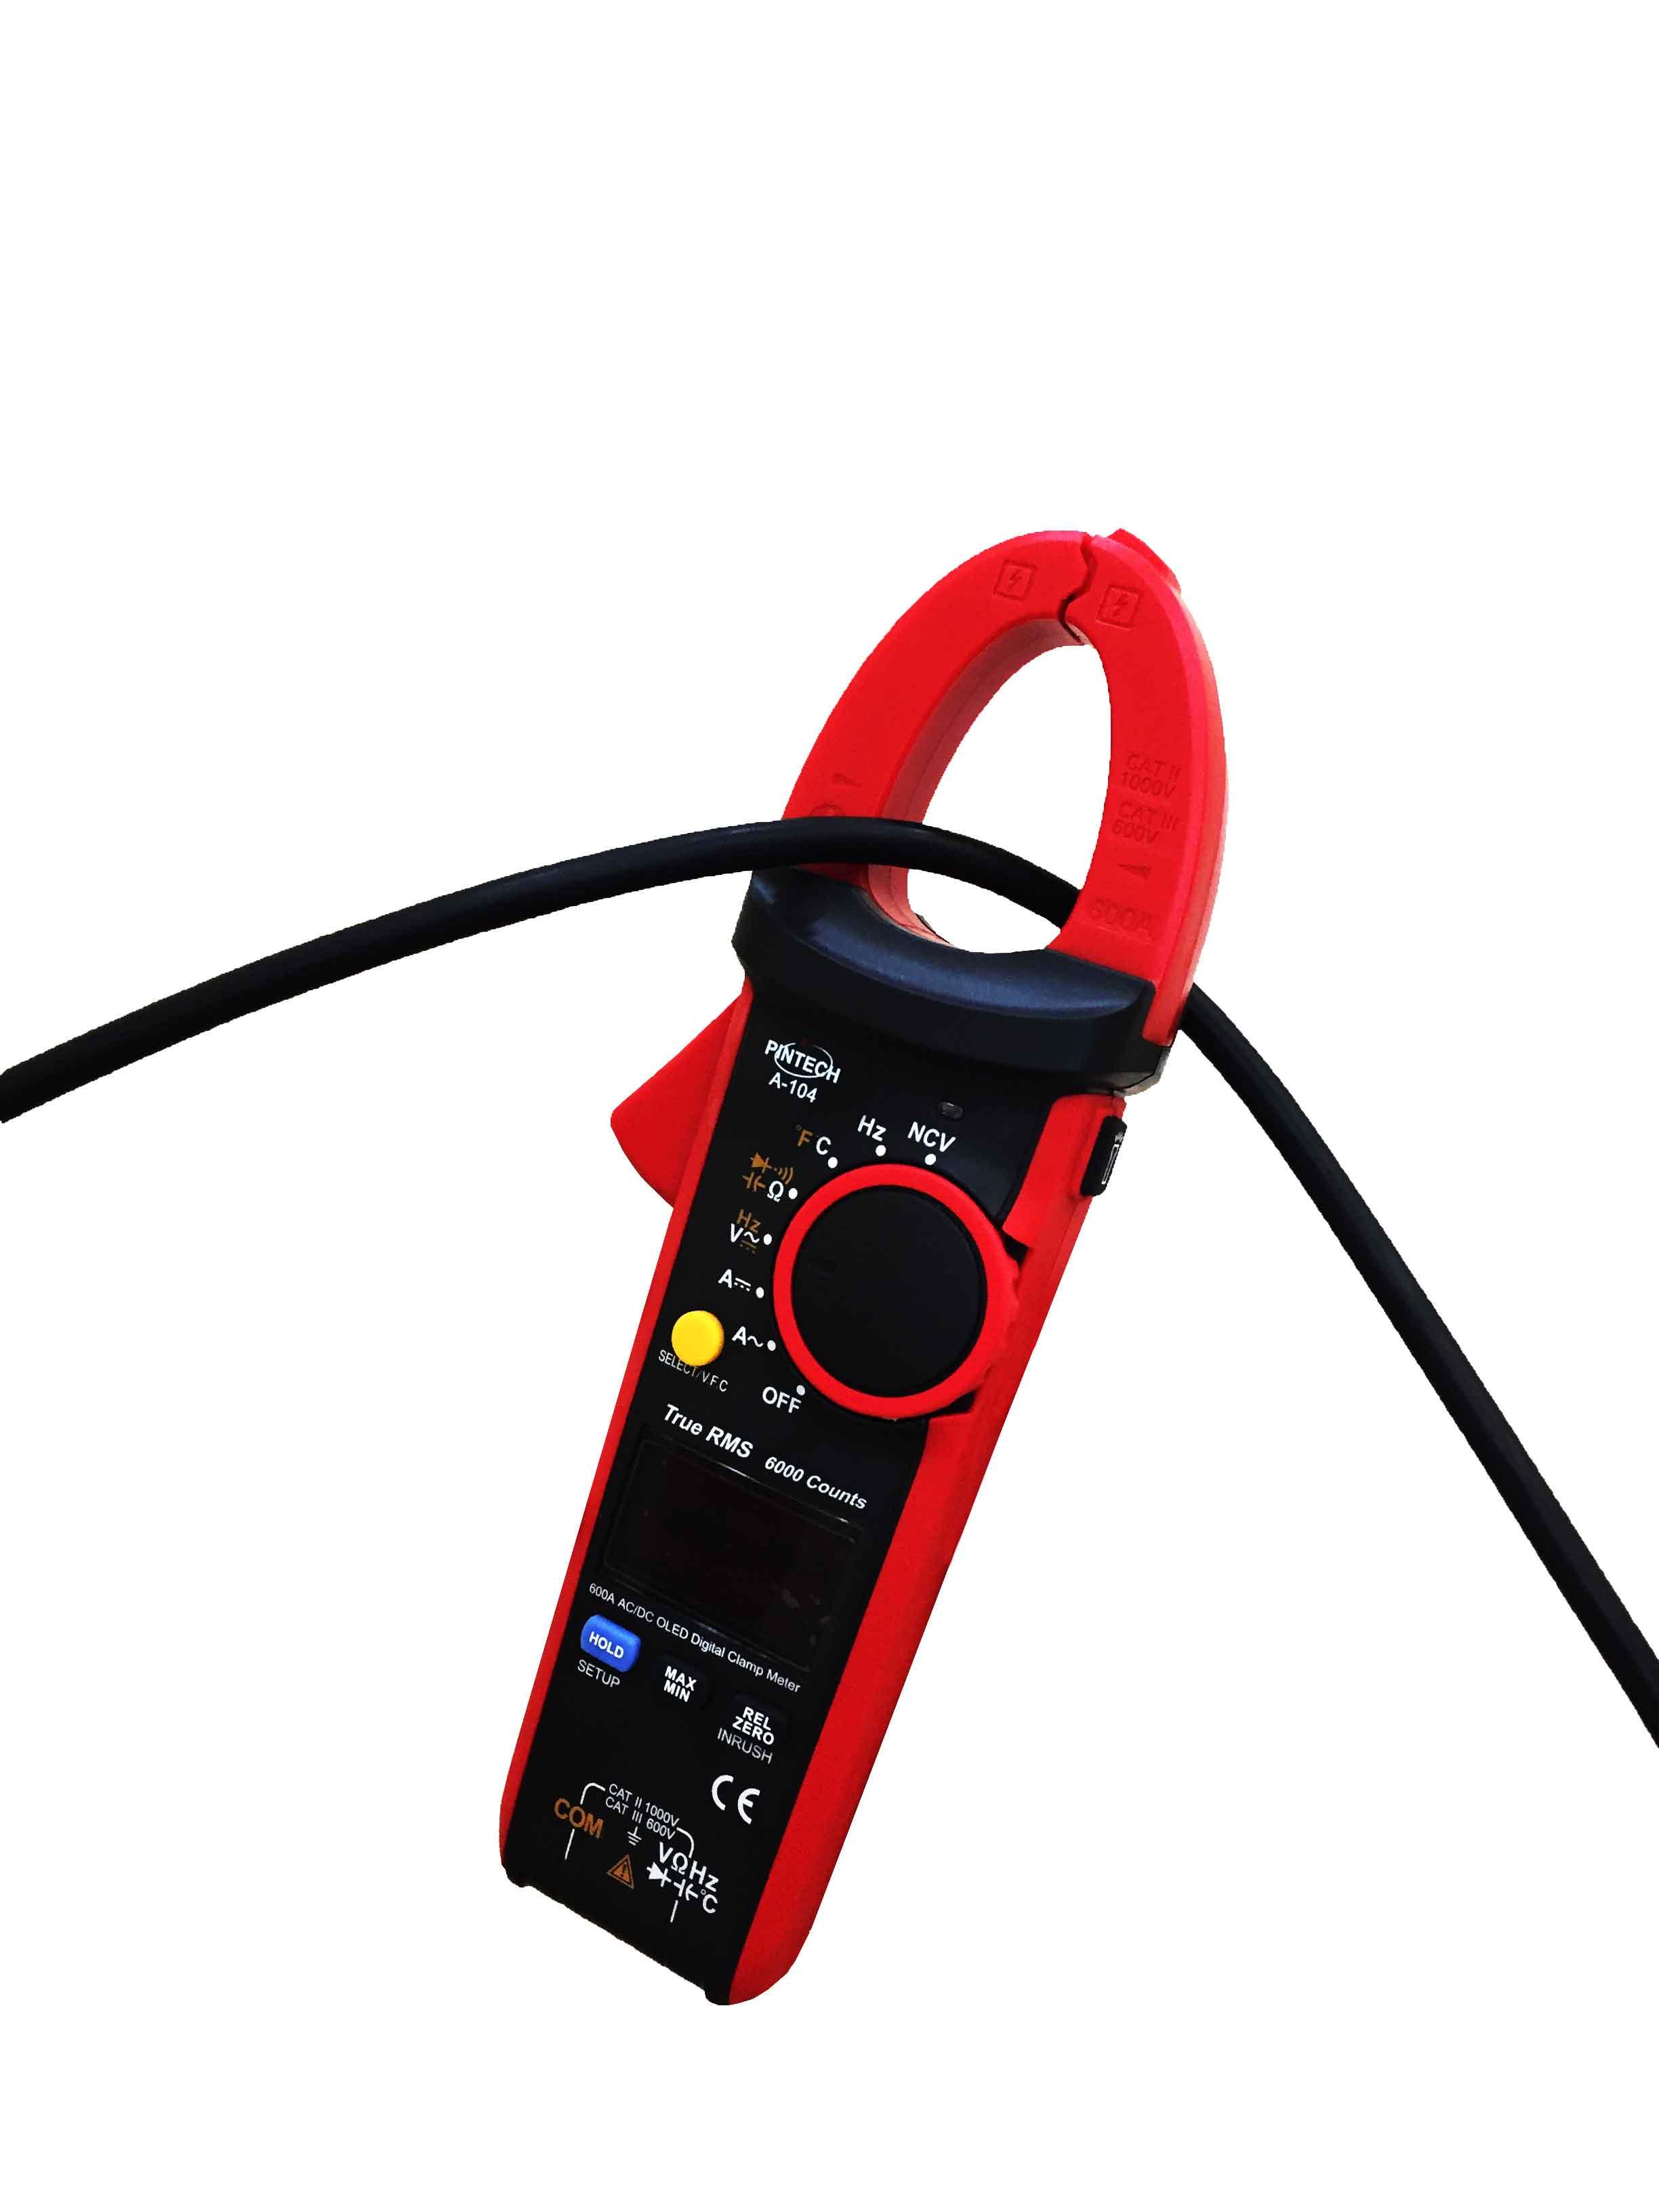 A103 400A Digital Clamp Meters